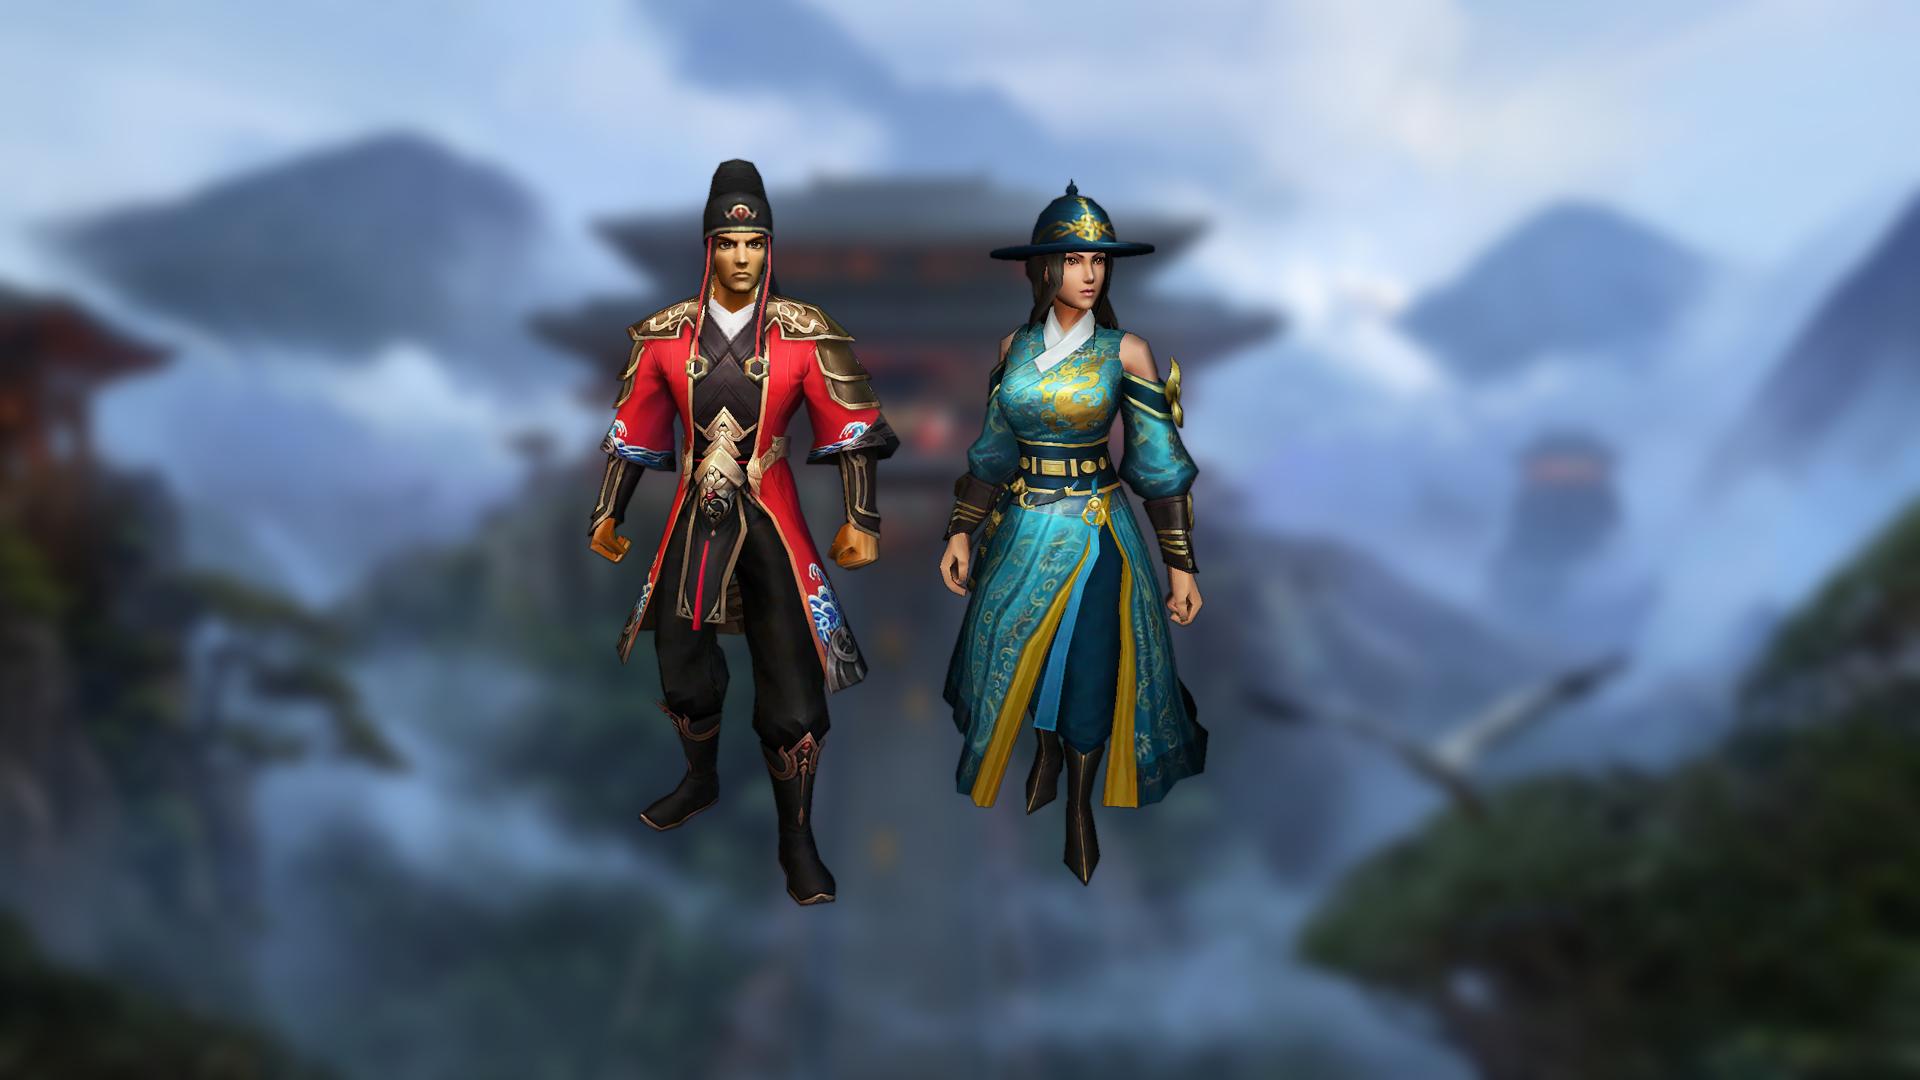 Japanese festive costumes